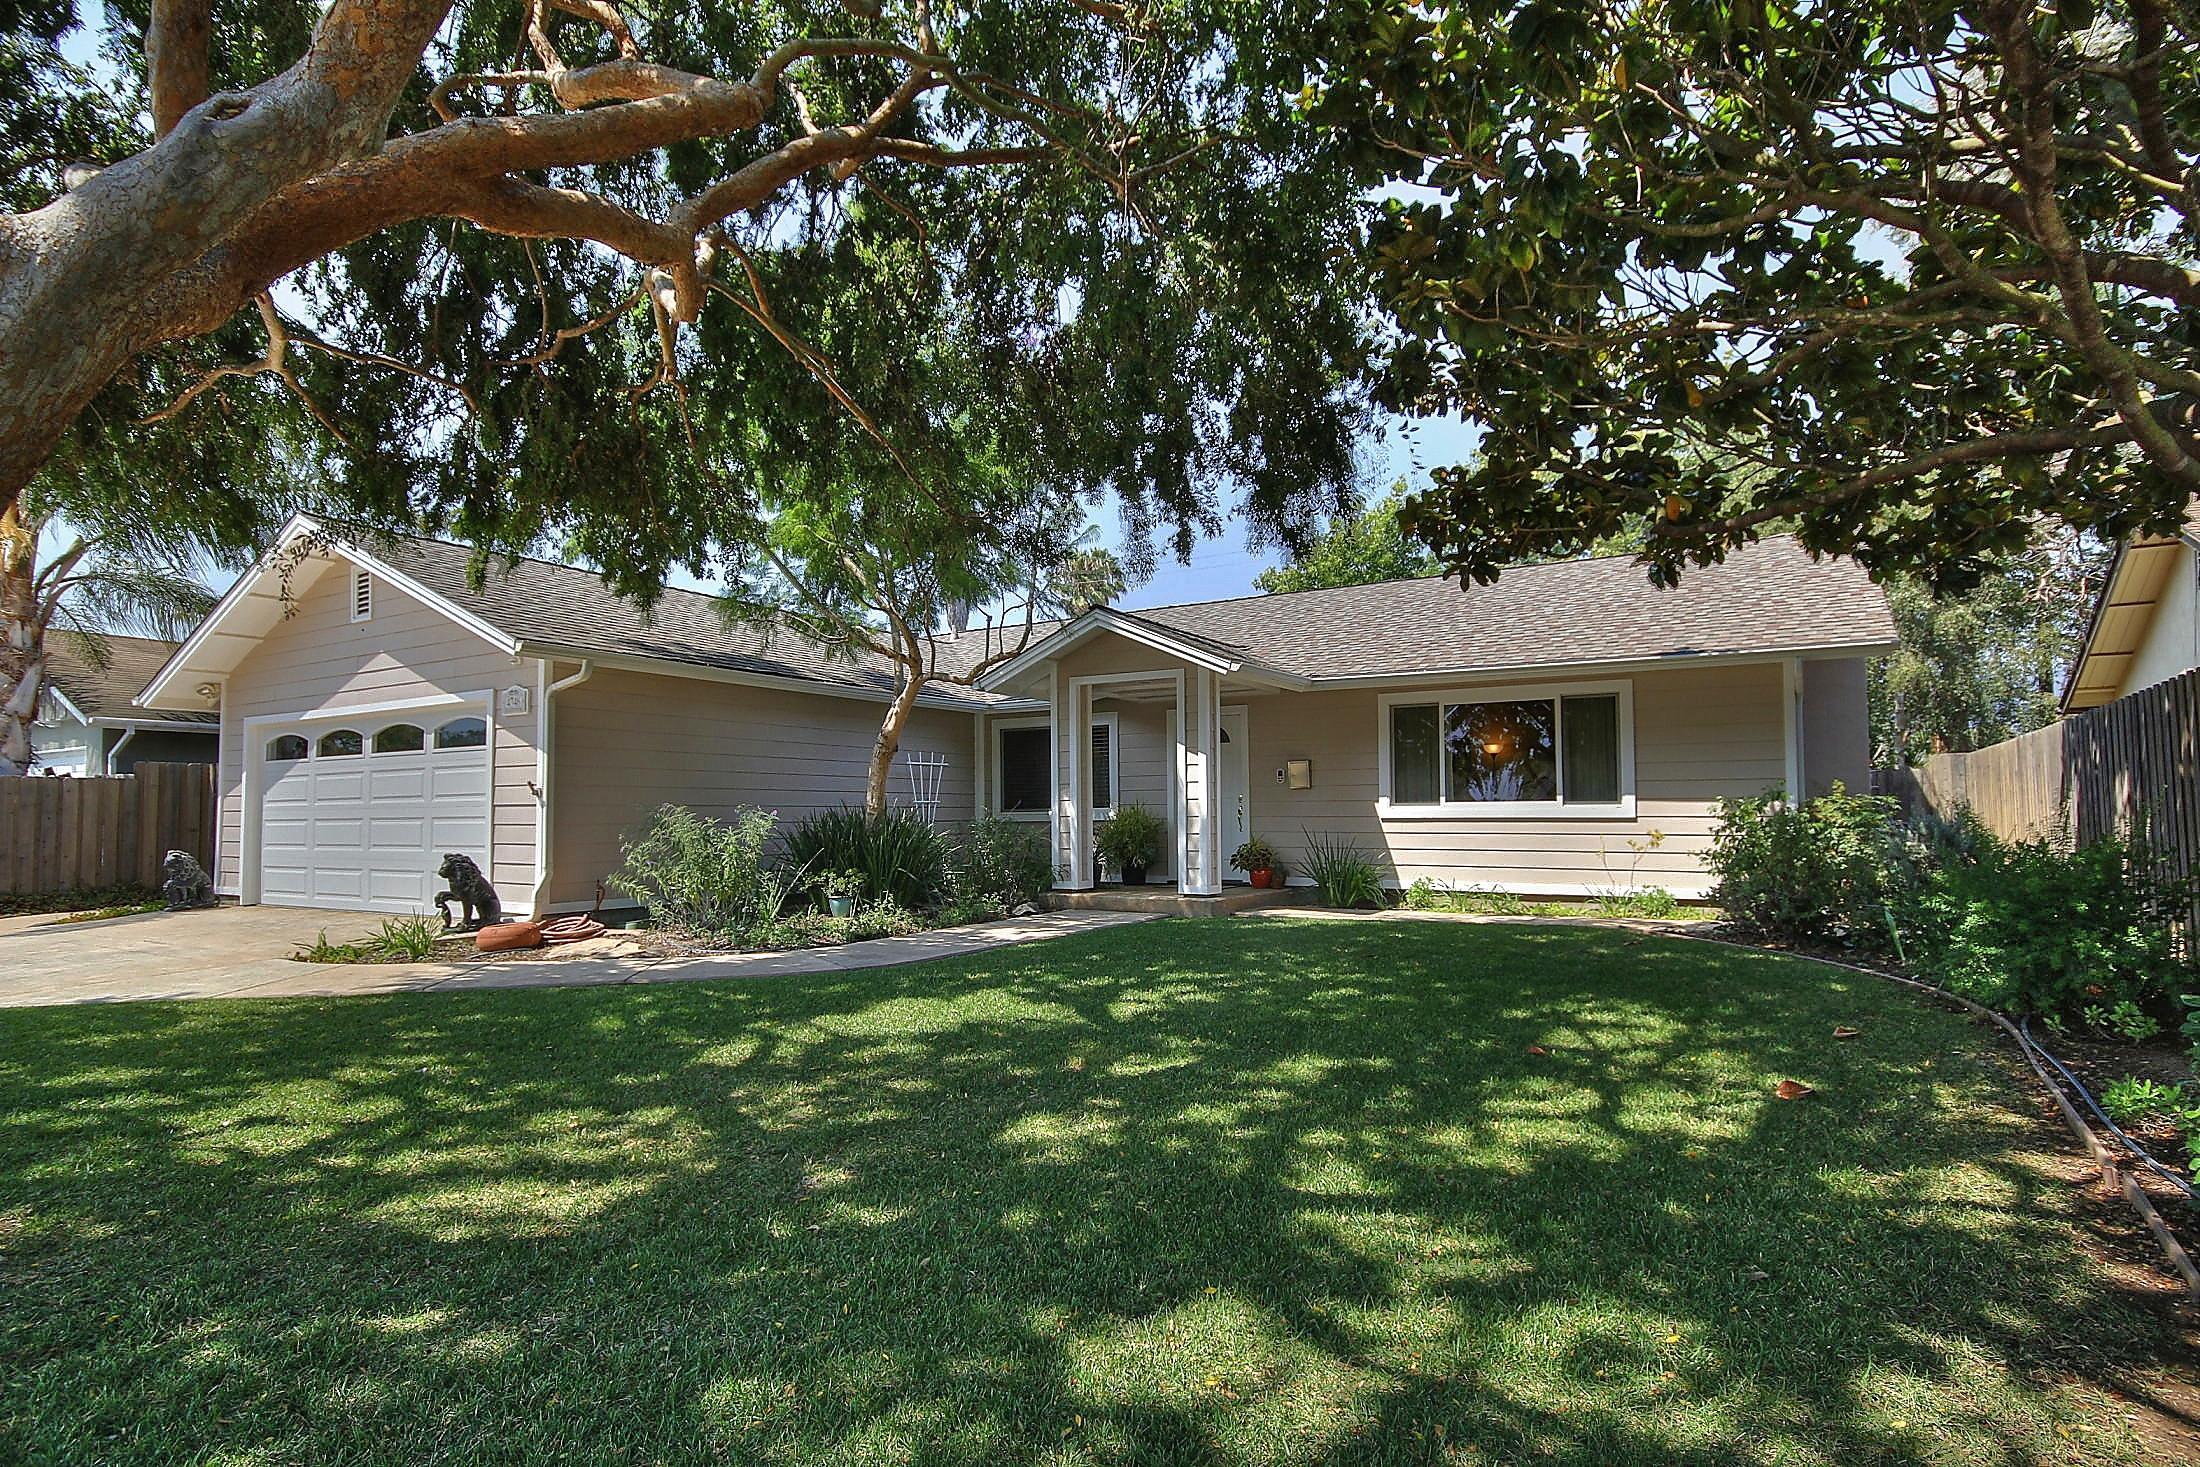 Property photo for 4746 Amarosa St Santa Barbara, California 93110 - 13-2958